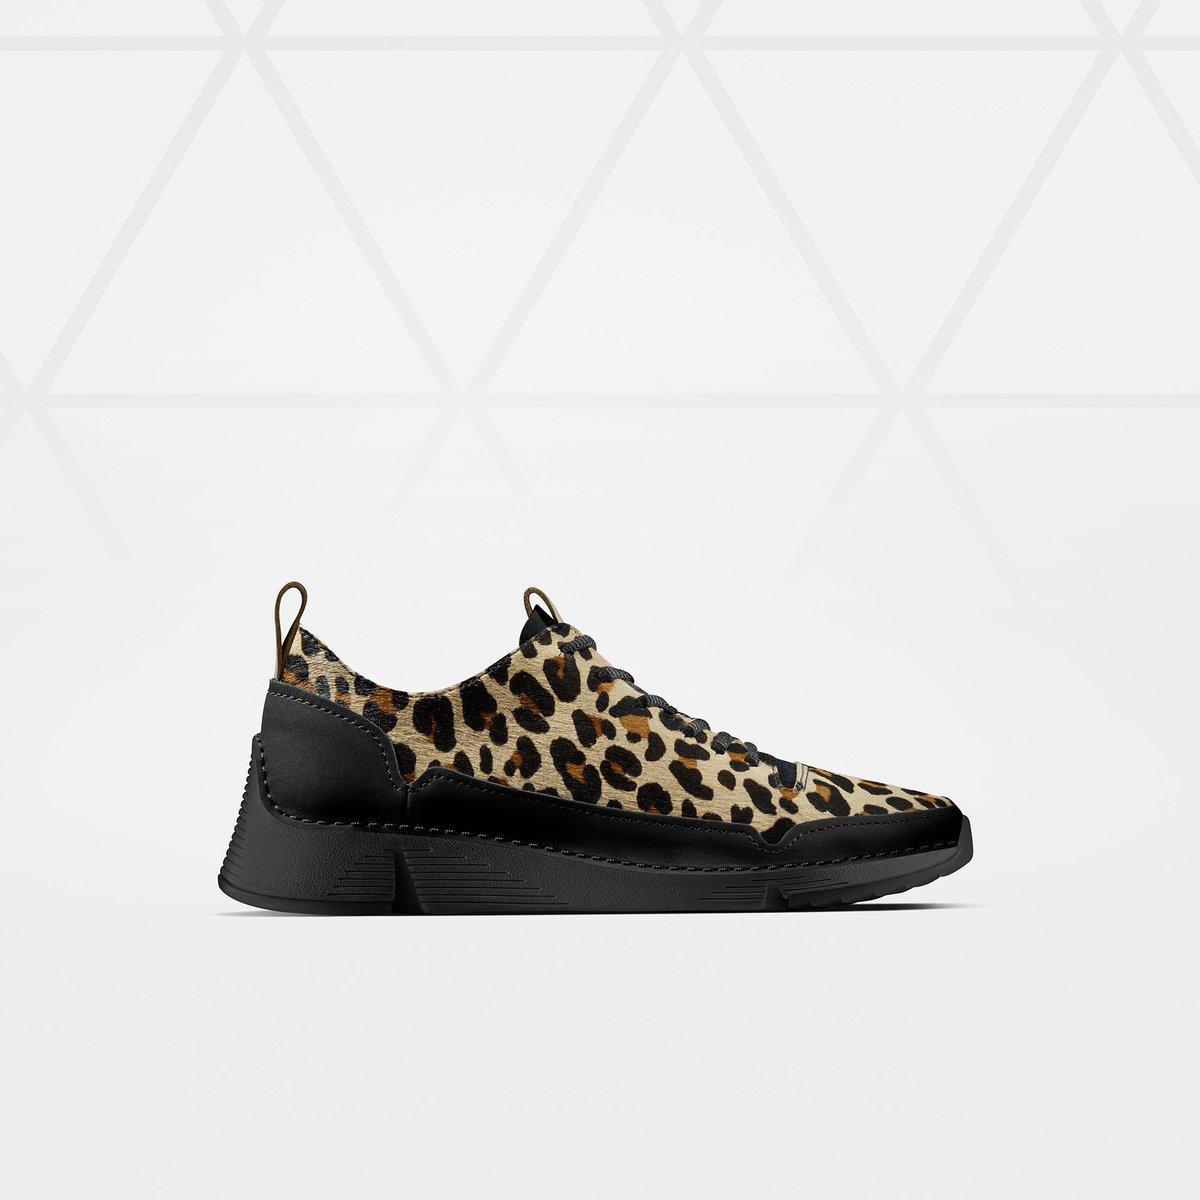 9fc76062 Clarks Shoes (@clarksshoes) | Twitter